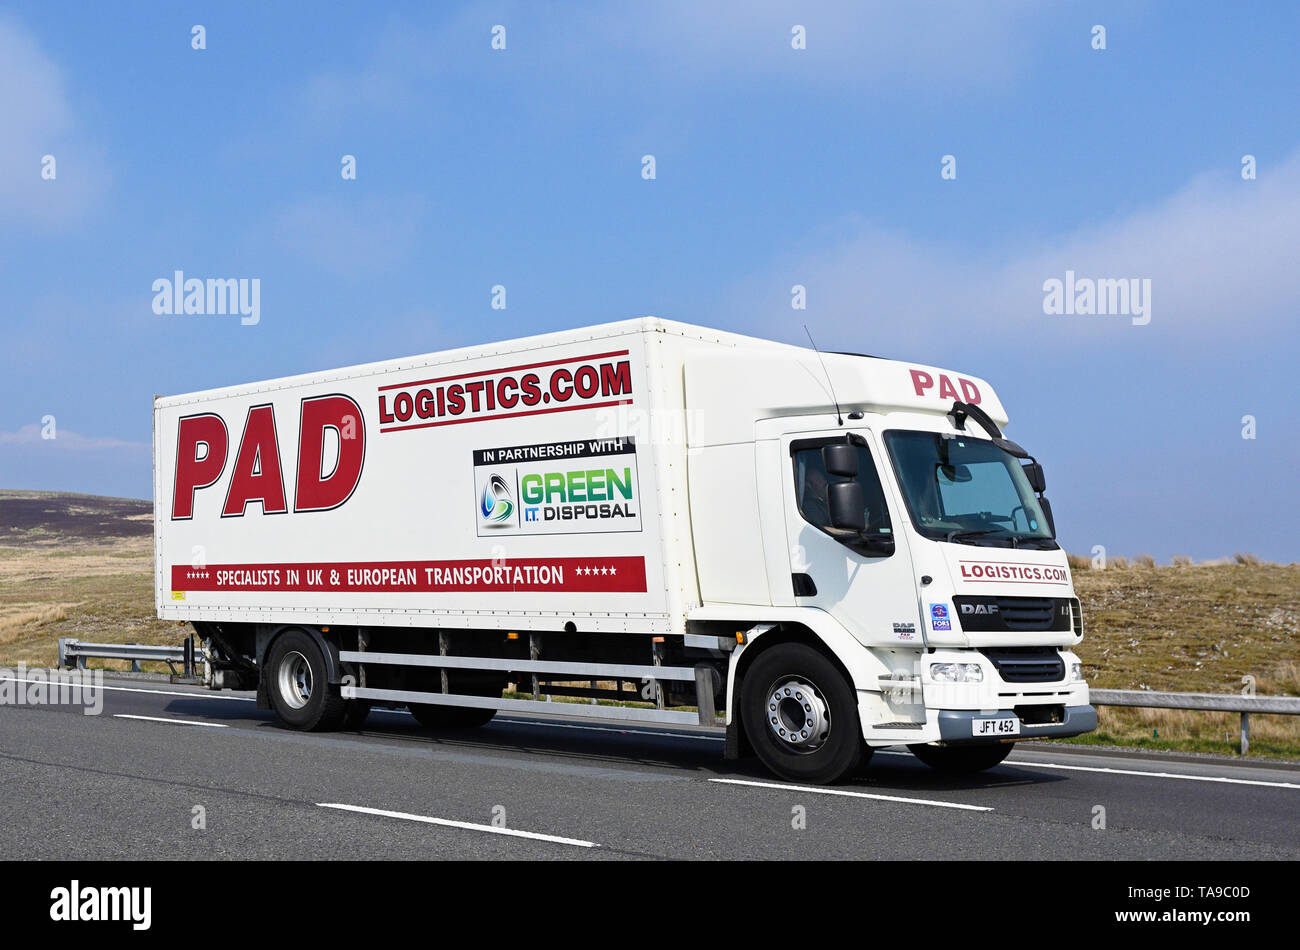 PAD Logistics, Specialists in U.K. and European transportation, HGV. M6 Motorway, Southbound, Shap, Cumbria, England, United Kingdom, Europe. - Stock Image